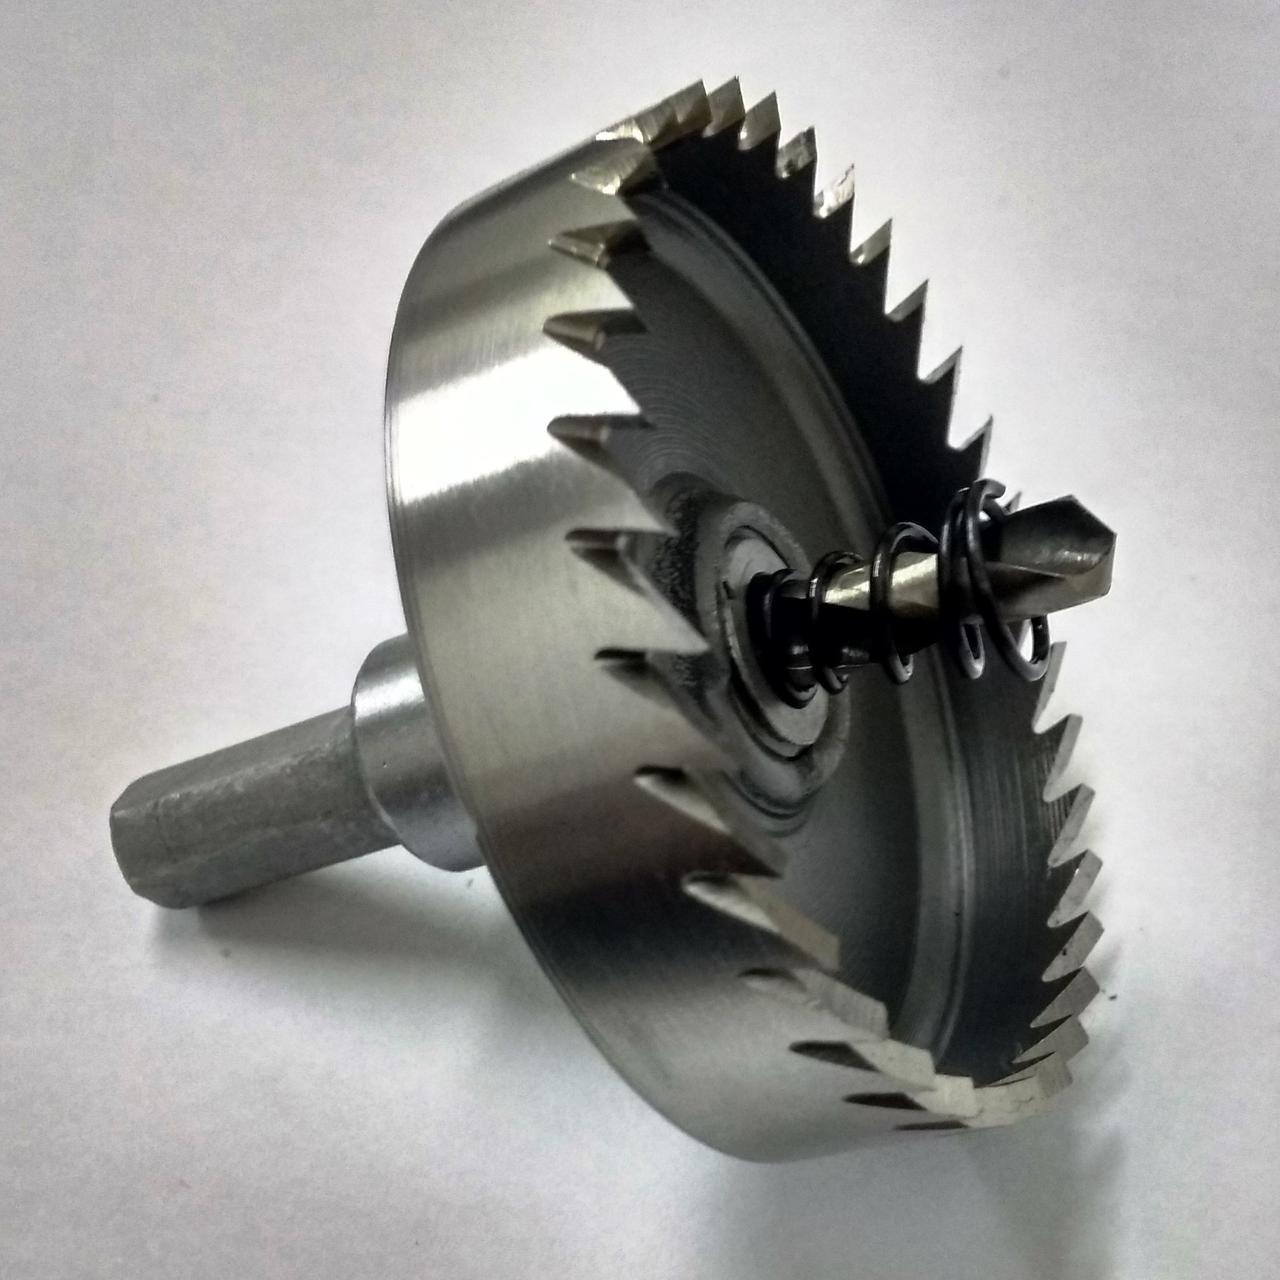 Коронка по металлу (Фреза корончатая) ф.65мм Р6М5